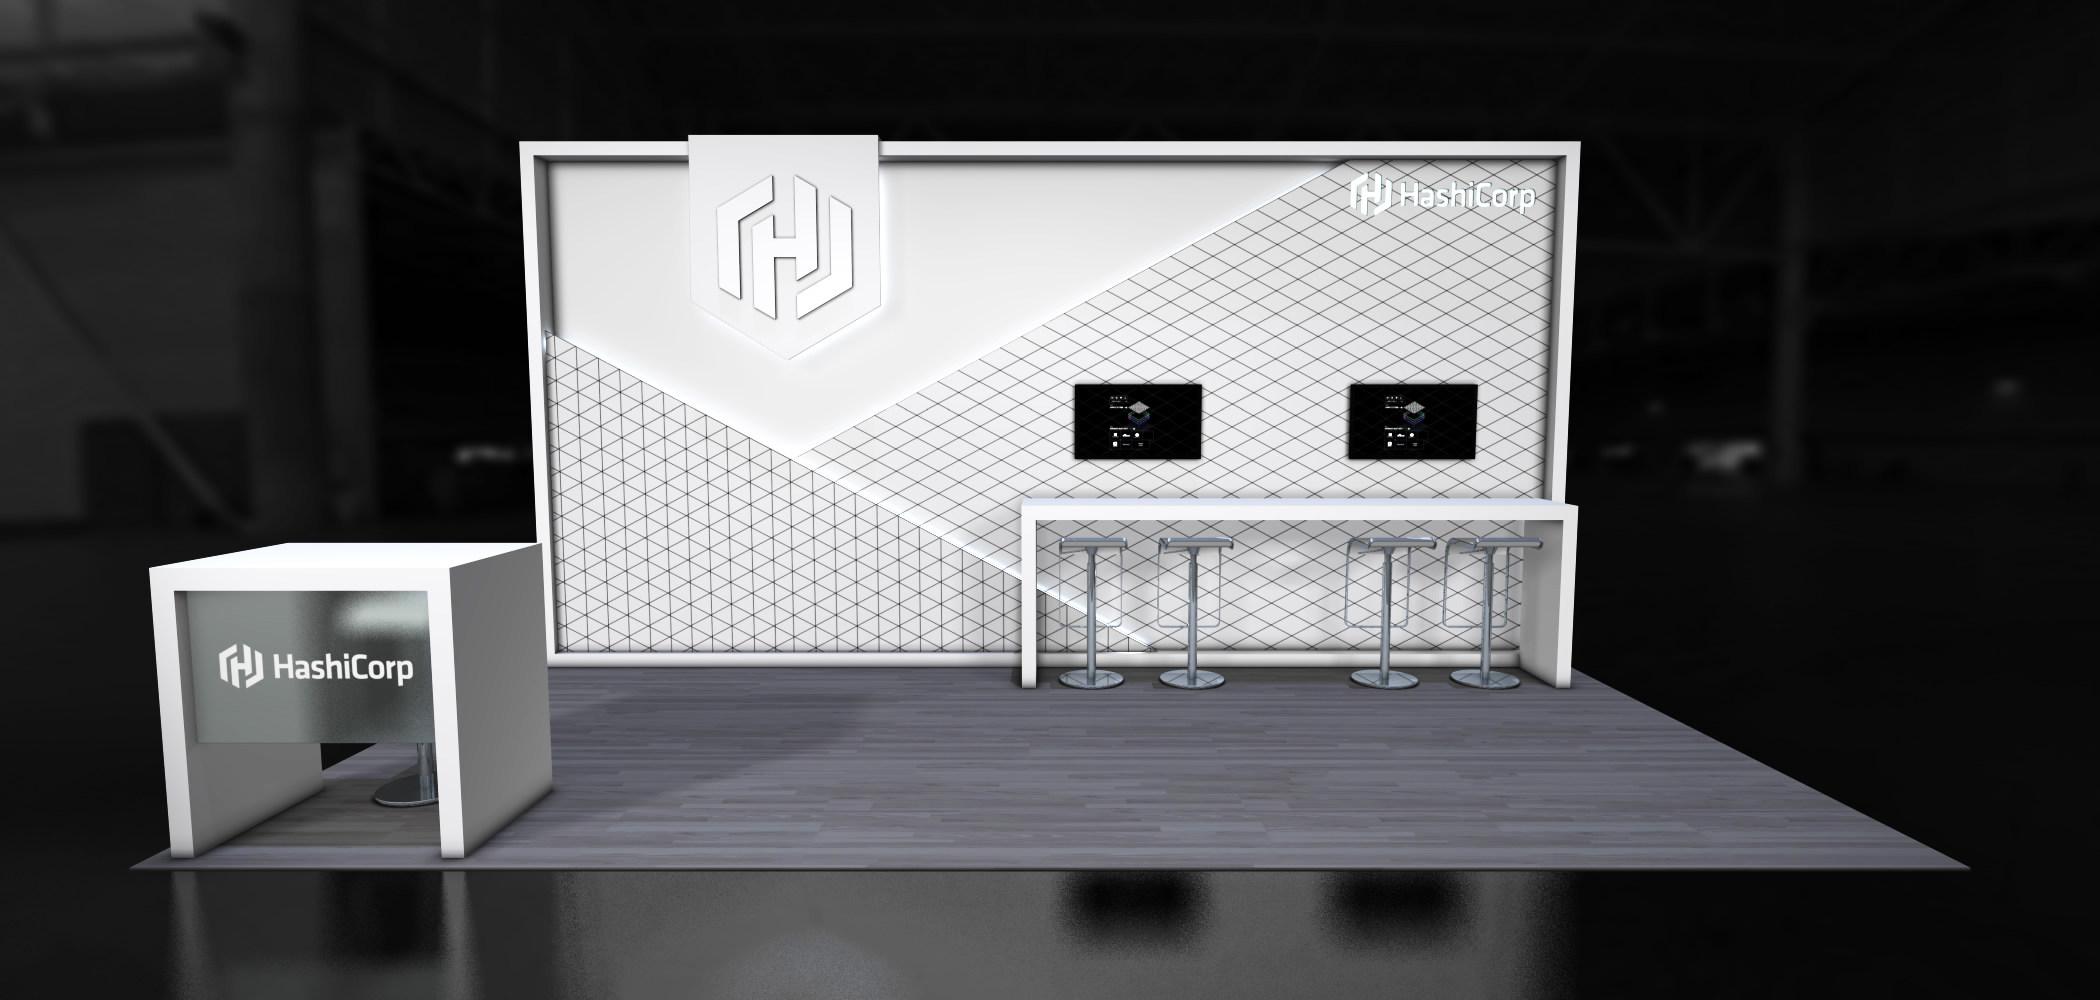 HashiCorp-AWSRI-2018-10x20-Concept3.0-FE